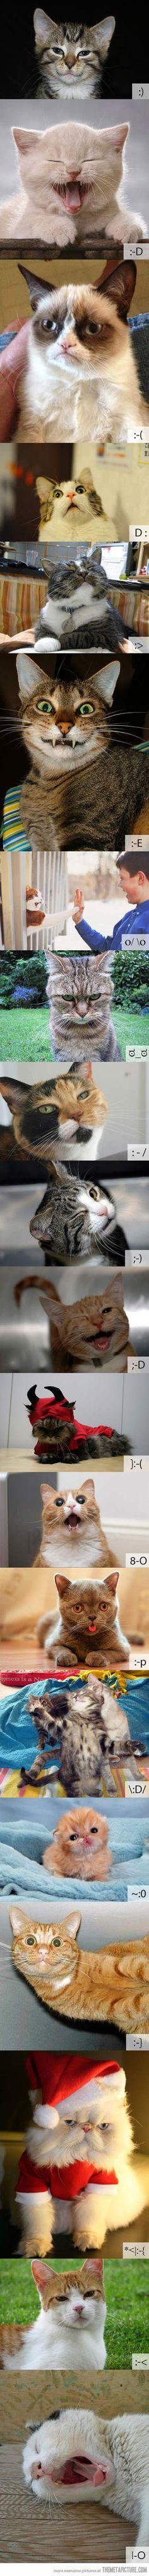 funny cat photos emoticons